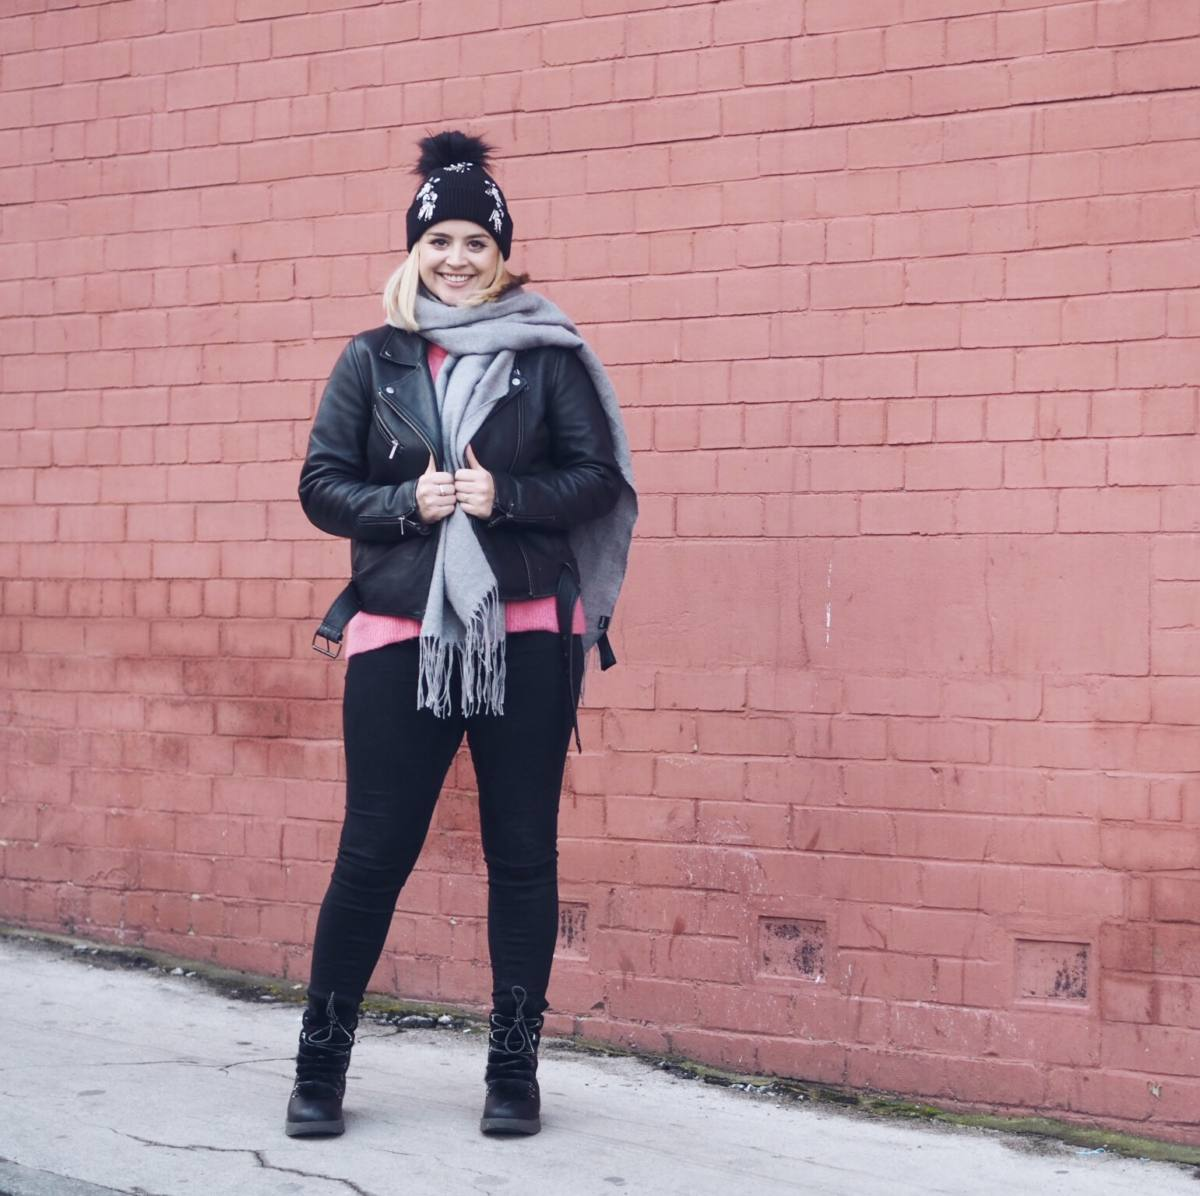 3 years of blogging